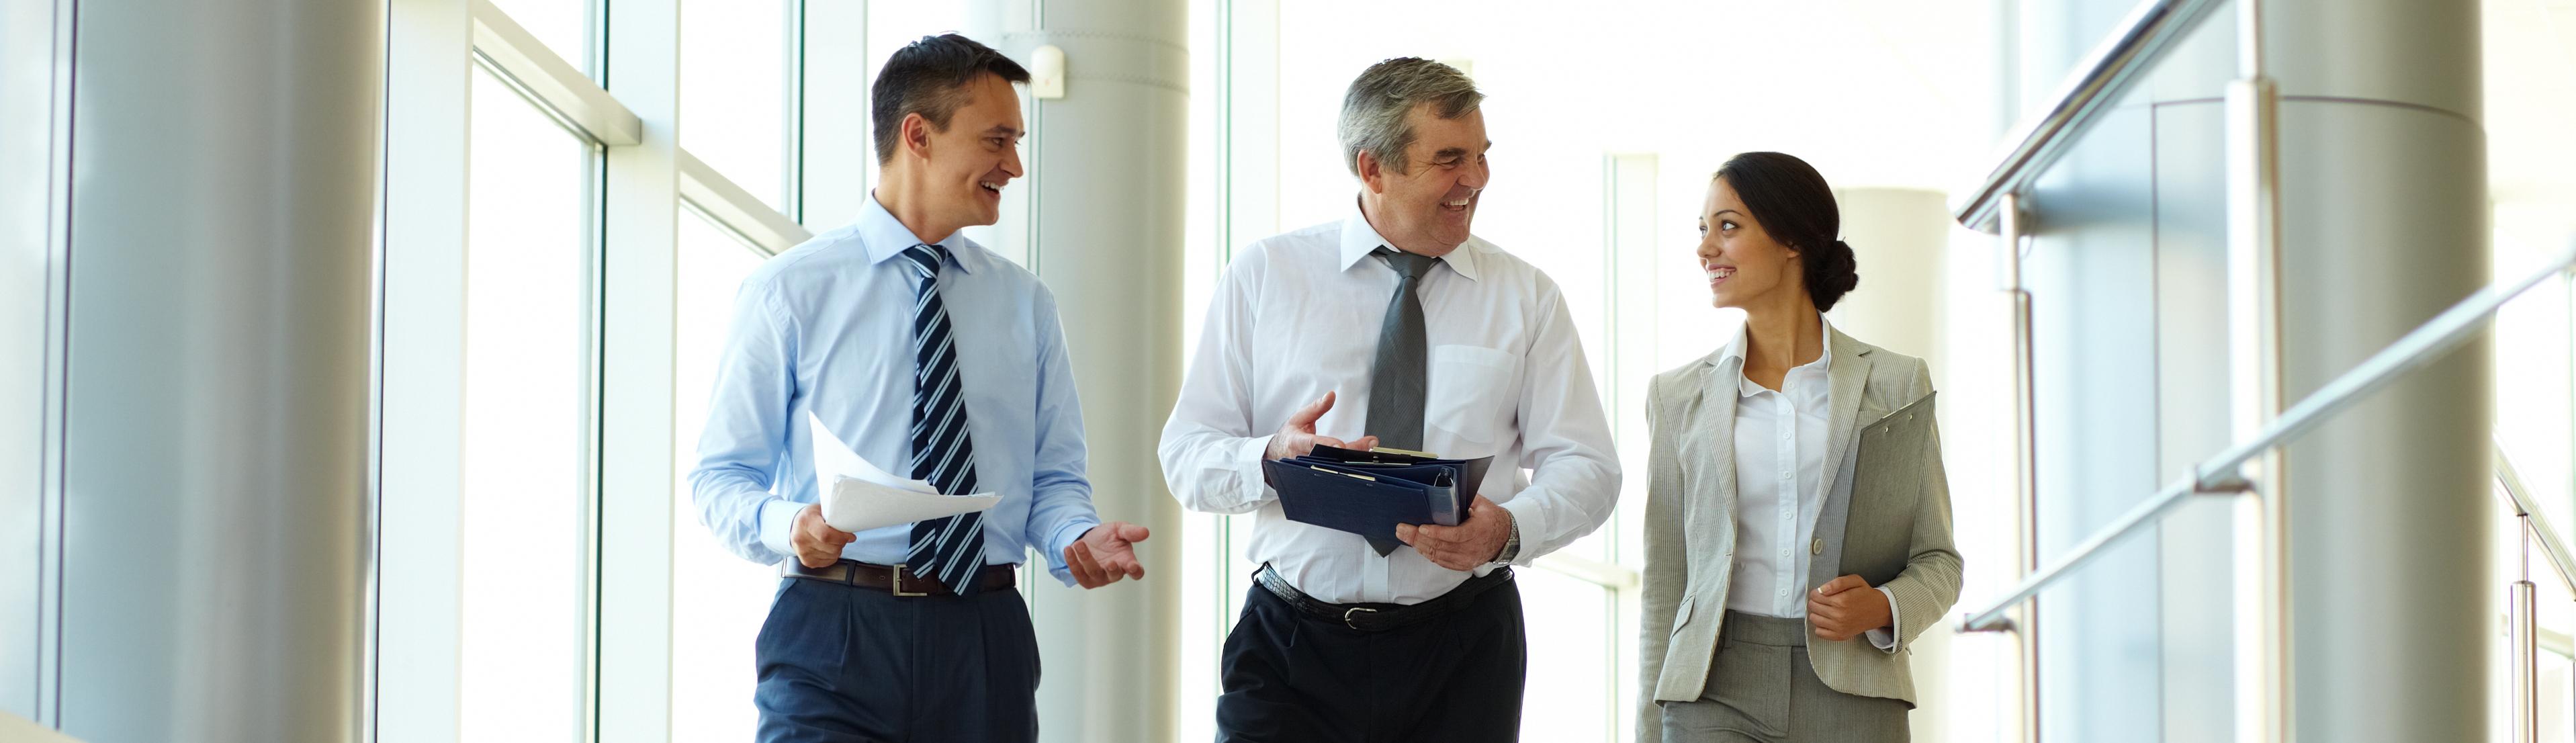 relationship management consulting webinar